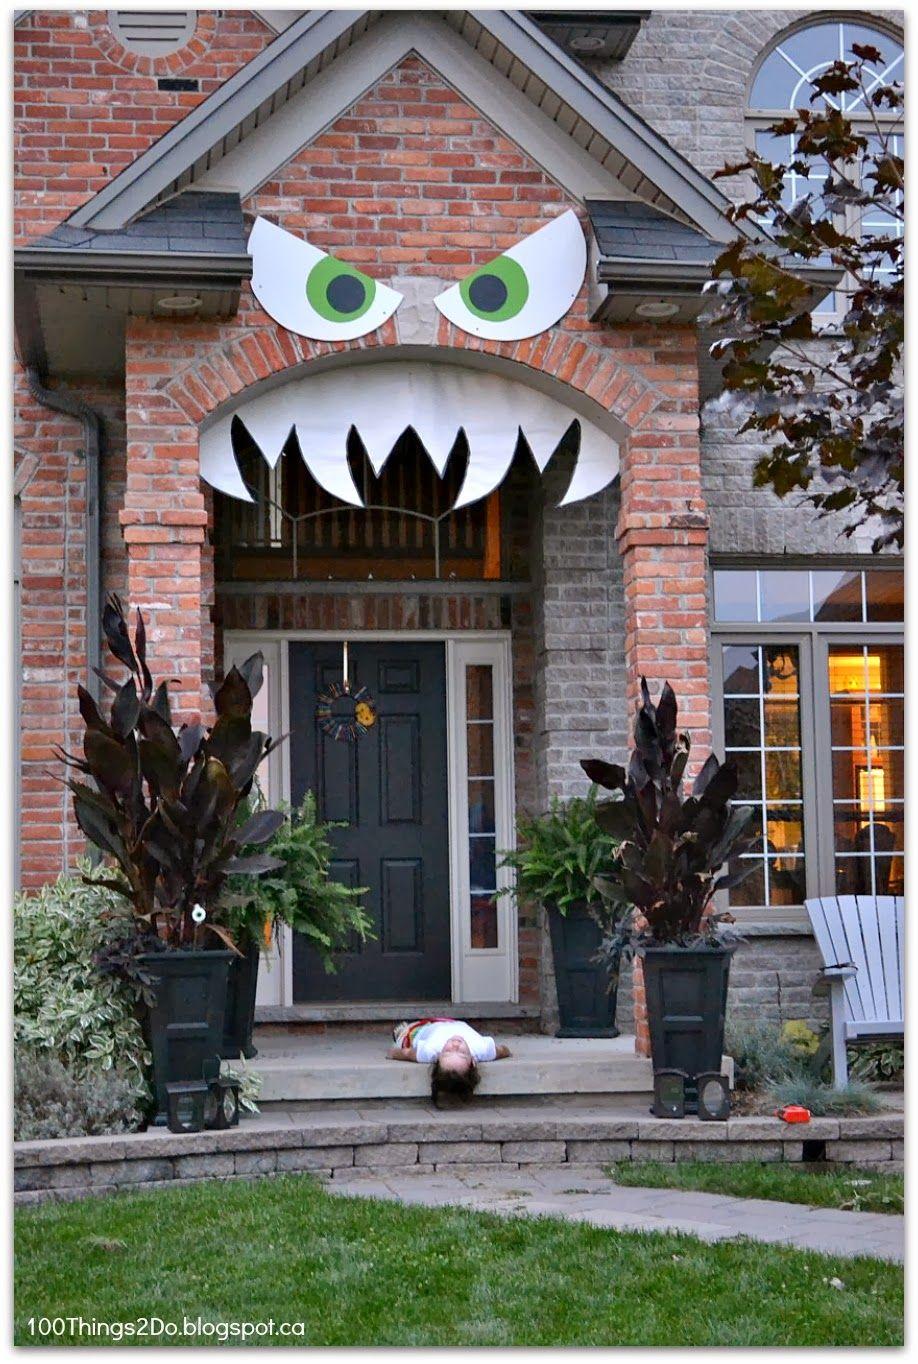 Design Halloween Front Porch Ideas diy monster face for your front porch monsterd hallowe halloween craftshalloween ideashalloween